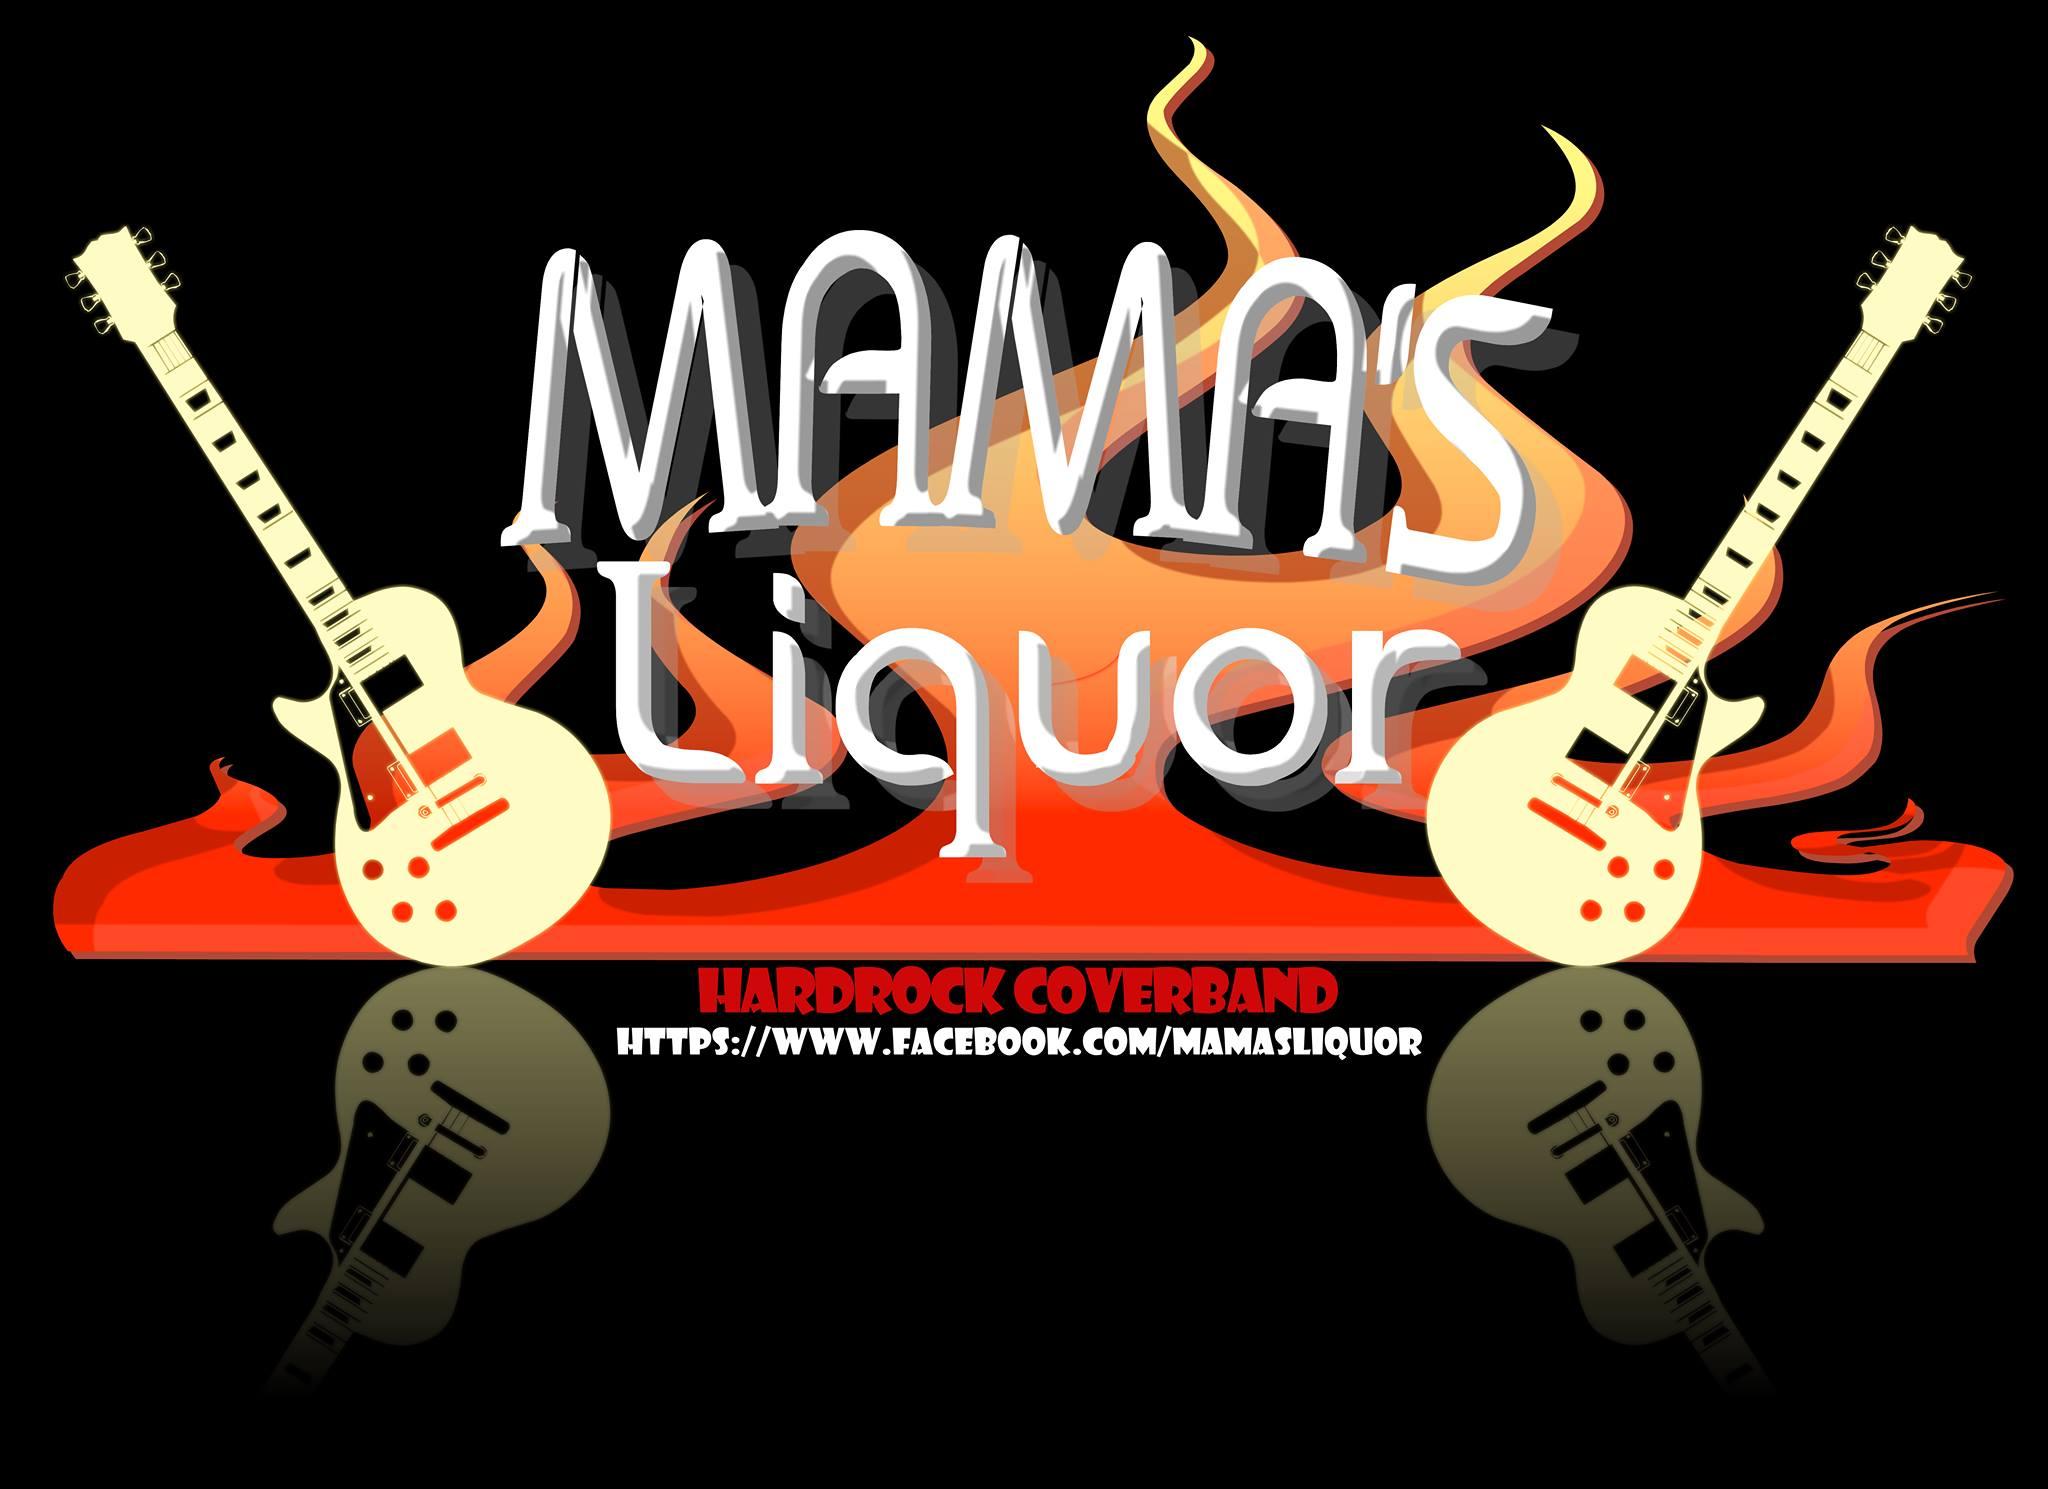 Boek Mama's Liquor Hardrock/rock coverband | Gigstarter